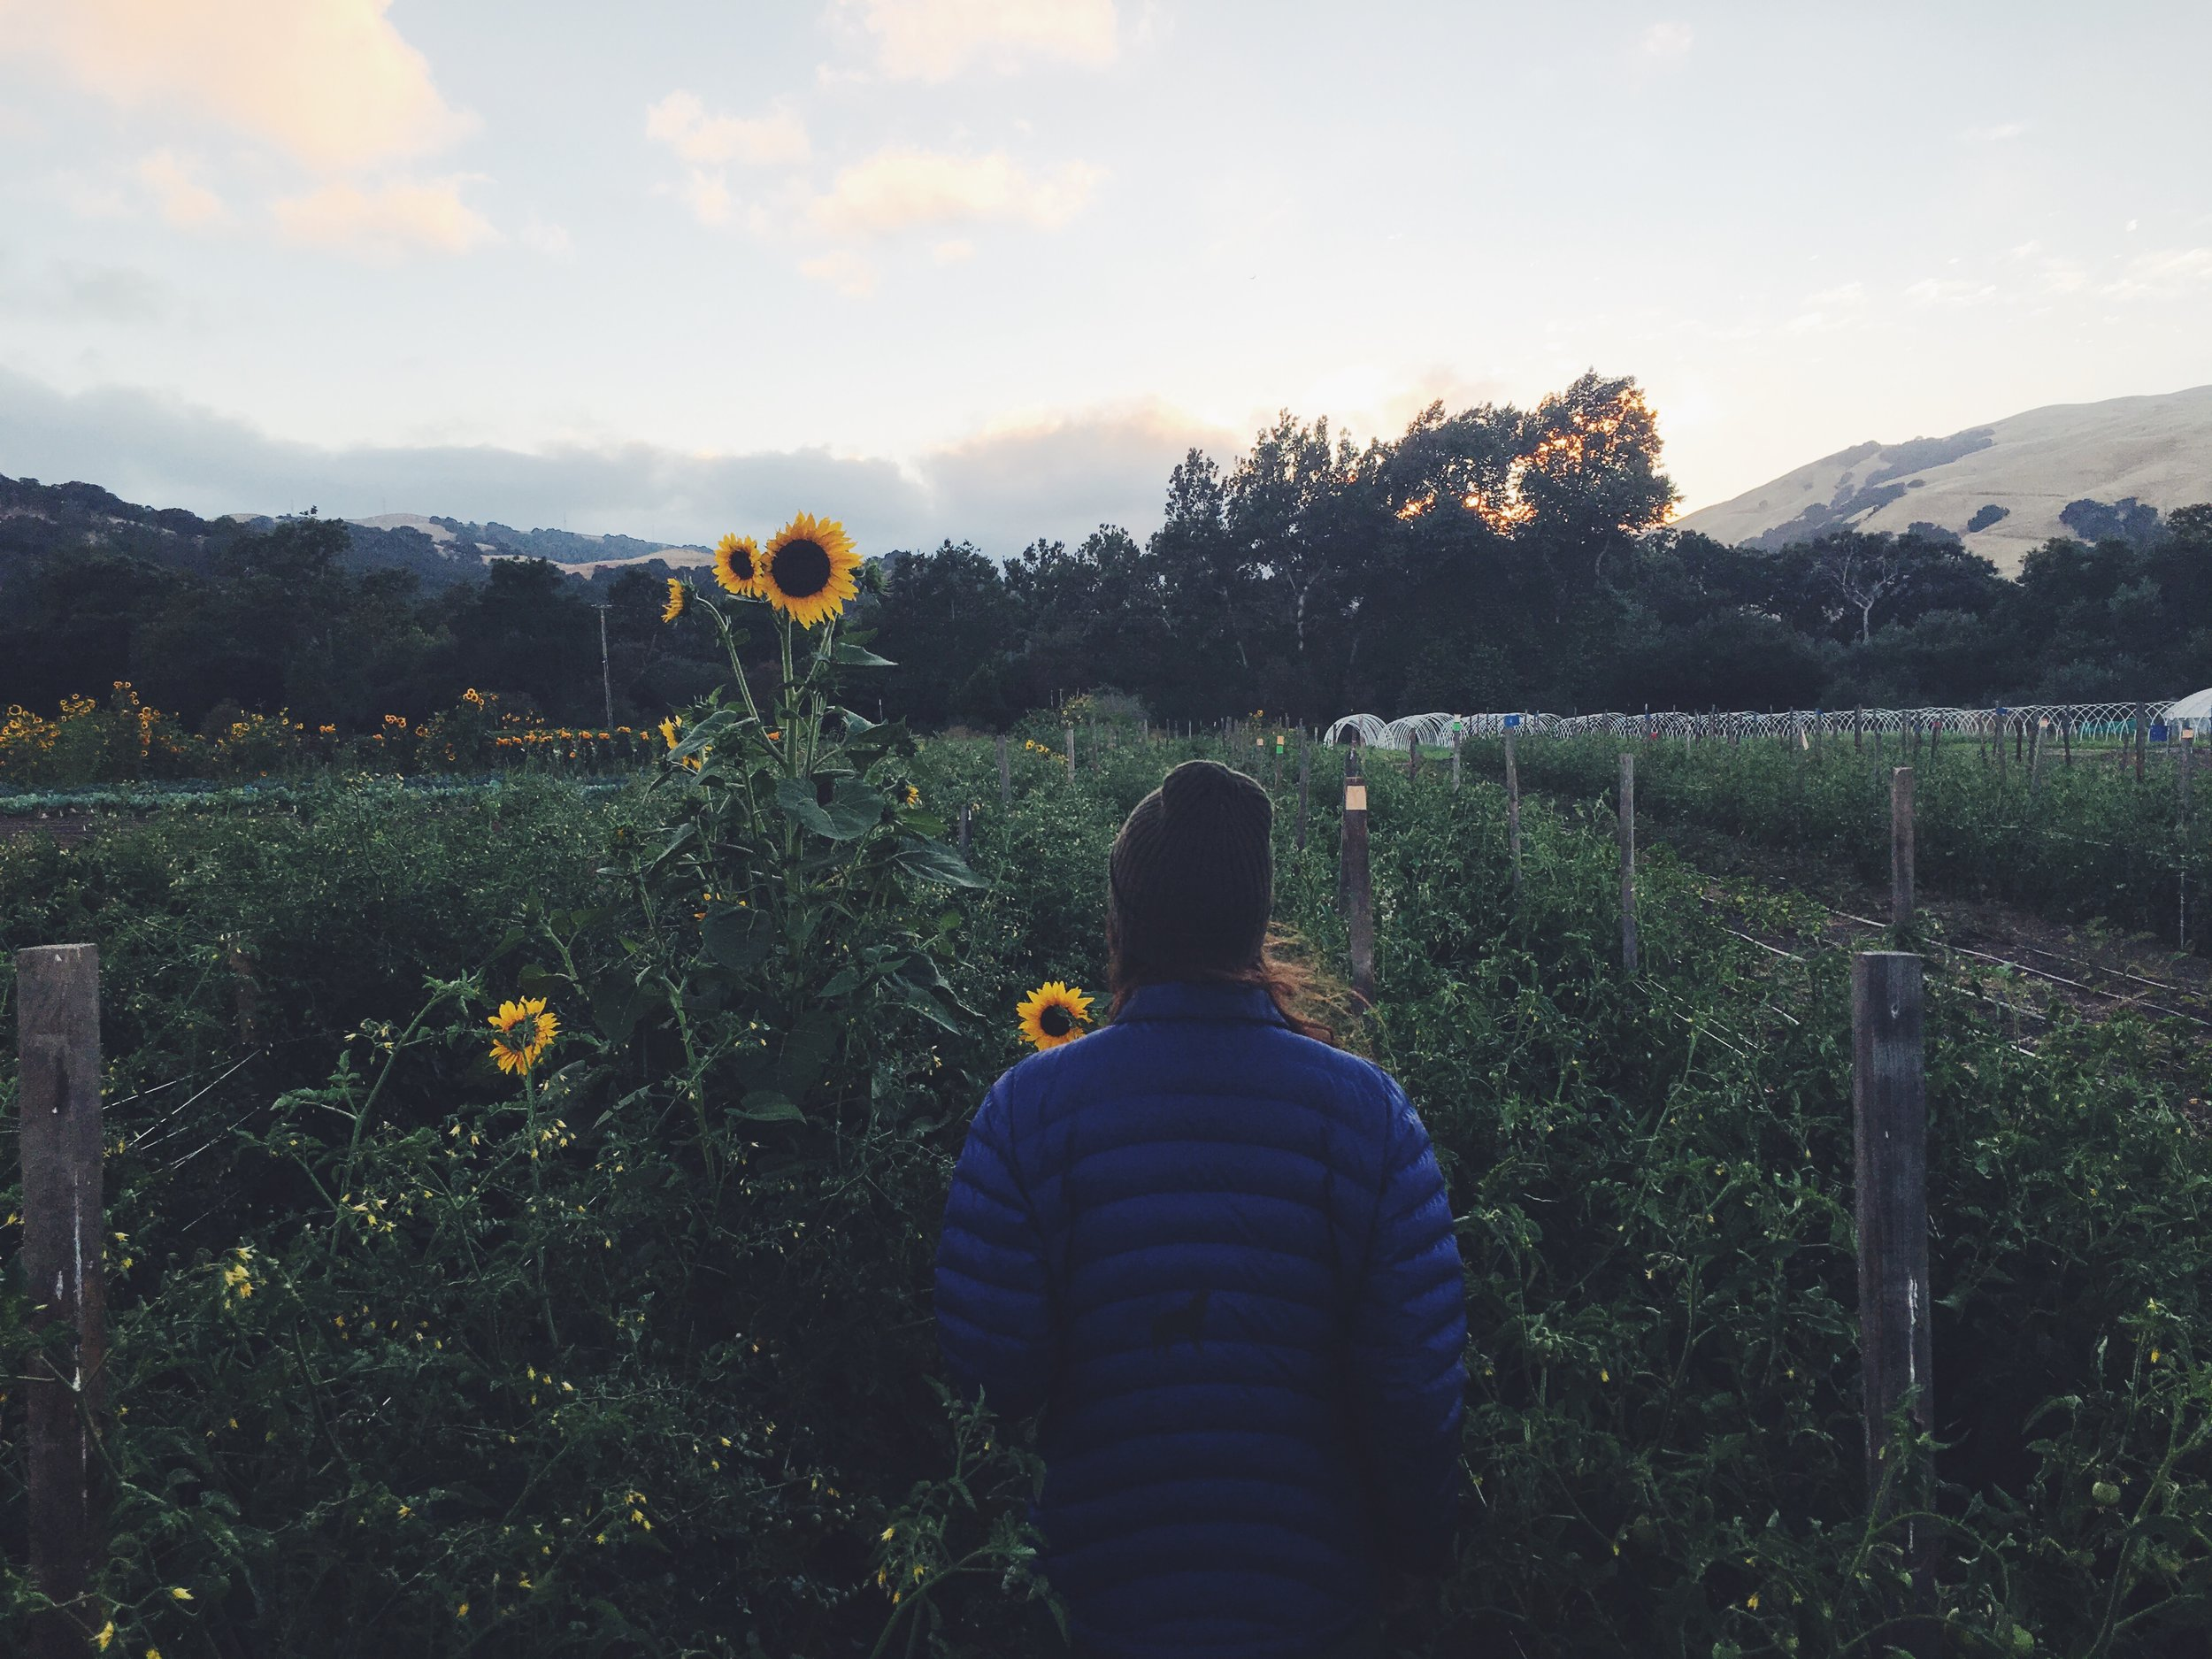 Photo credit: Happy Acre Farm